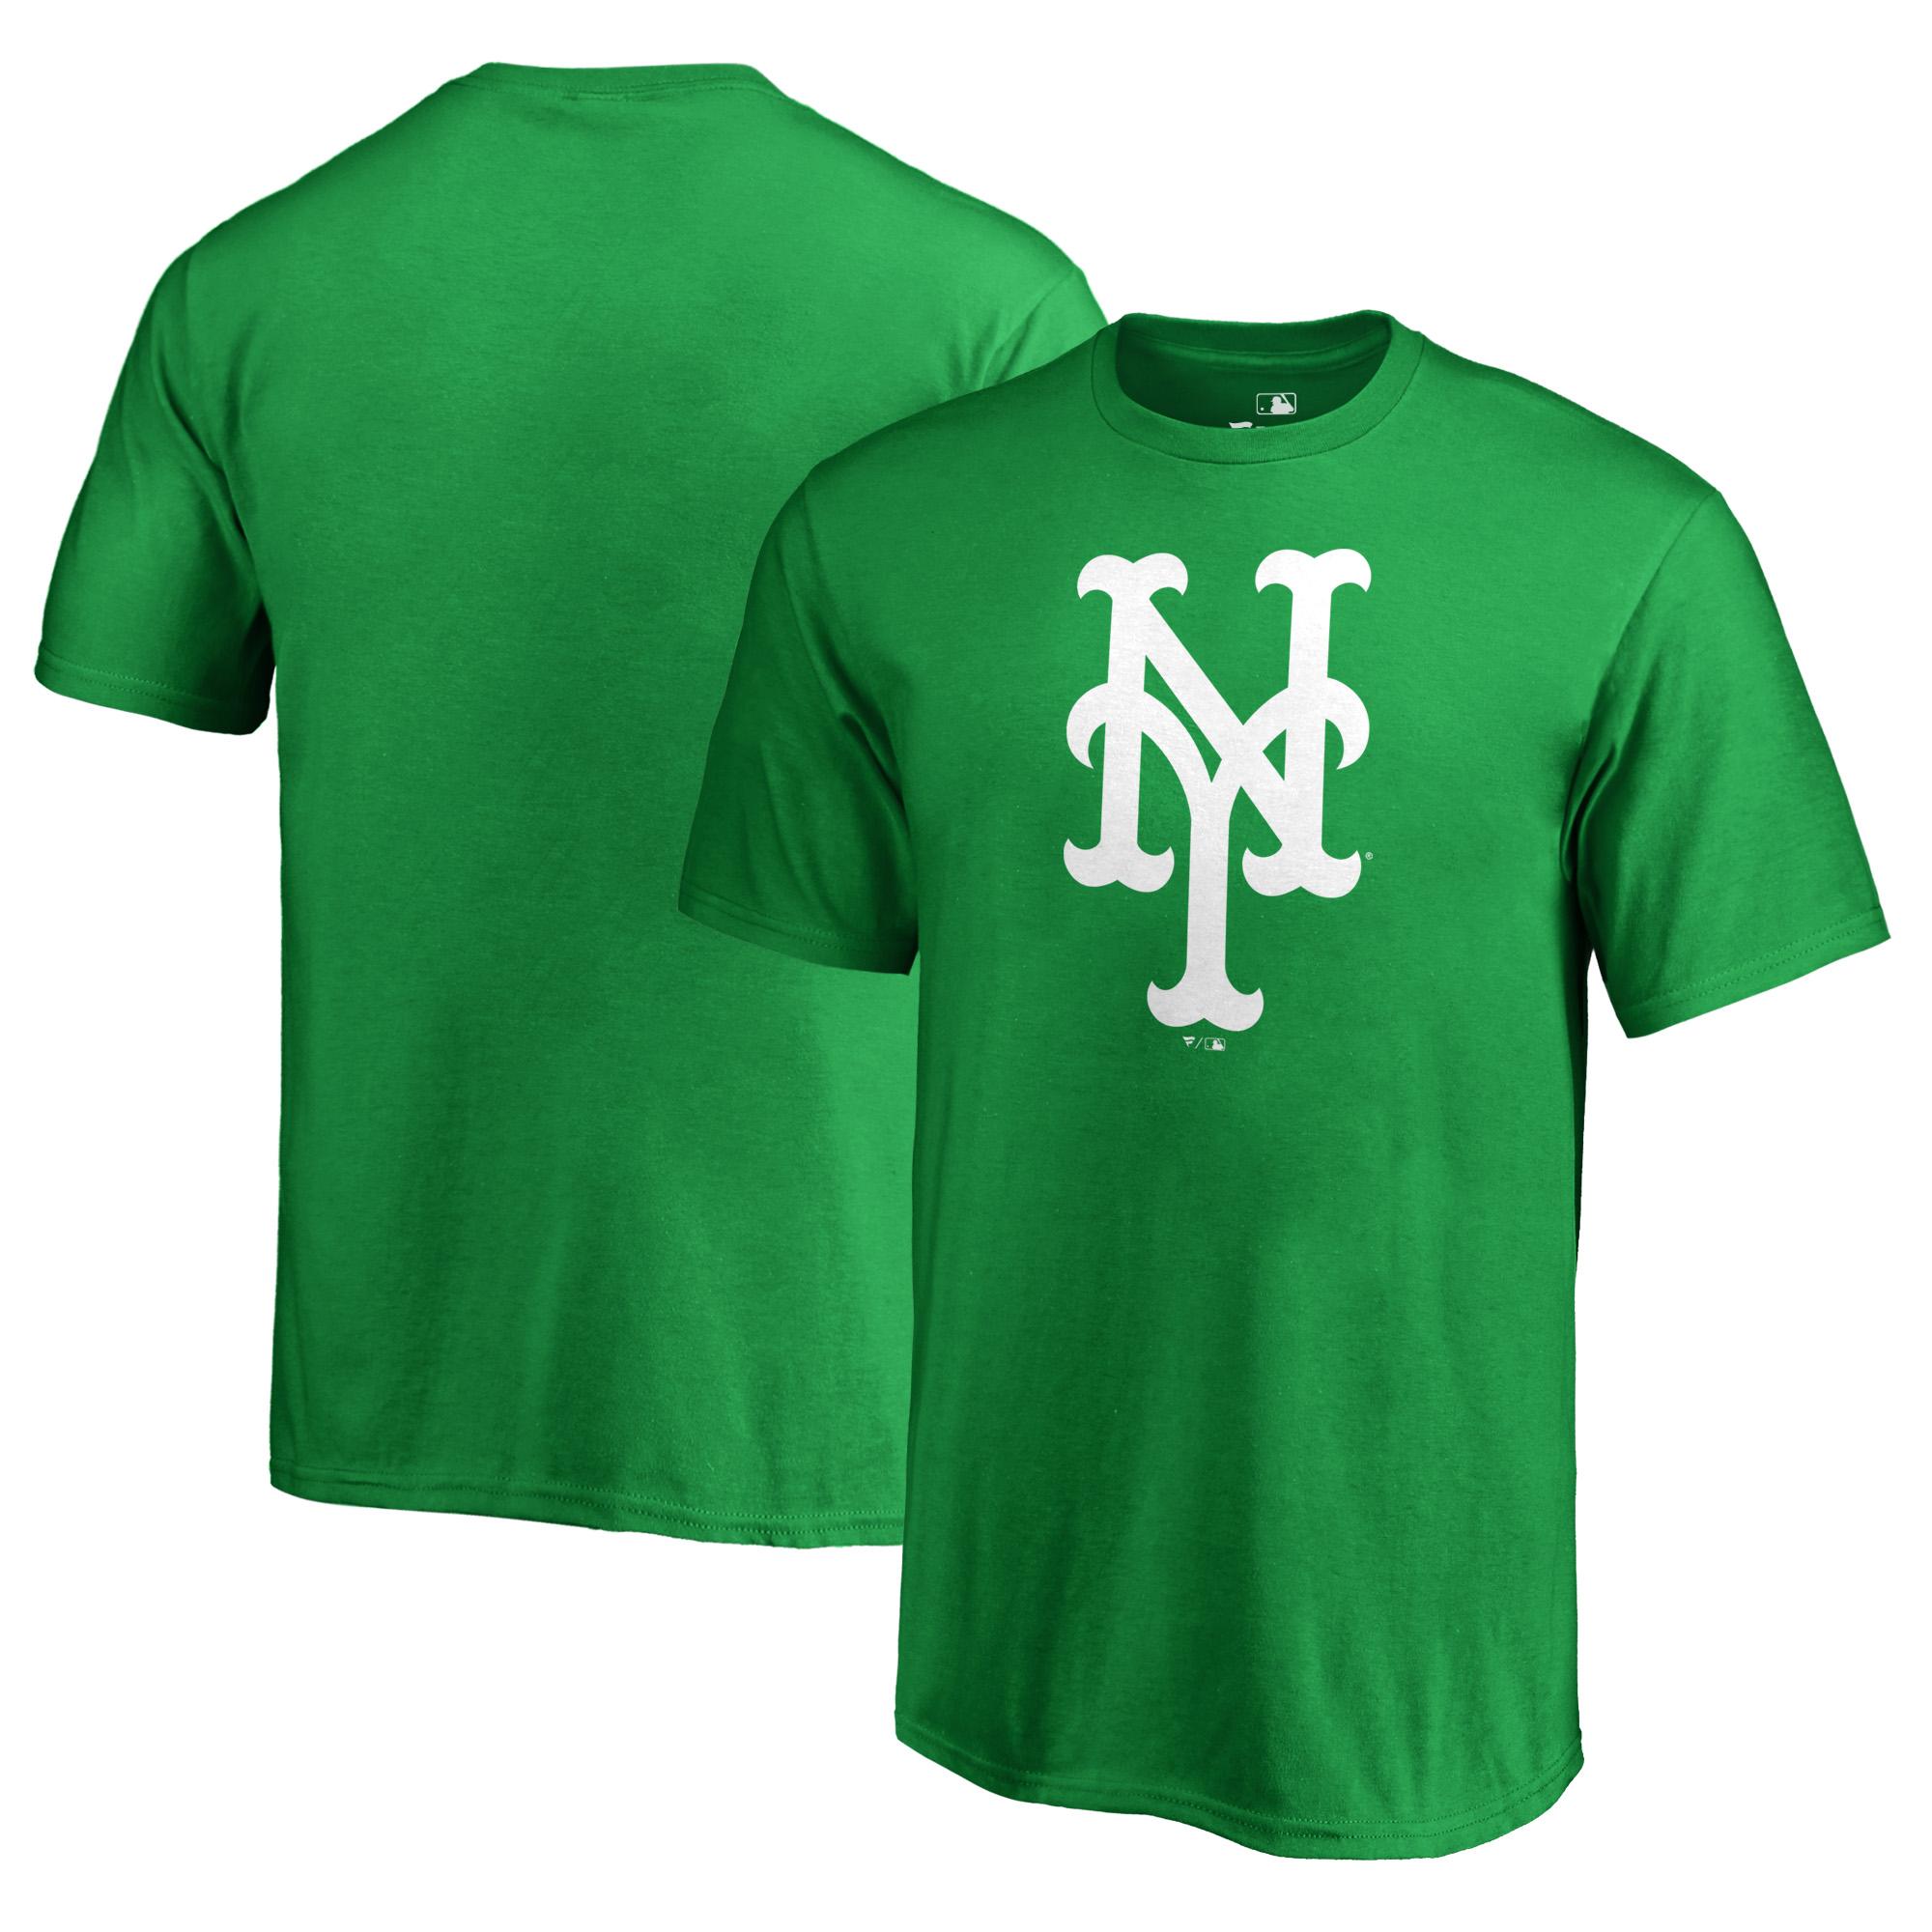 New York Mets Fanatics Branded Youth St. Patrick's Day White Logo T-Shirt - Kelly Green